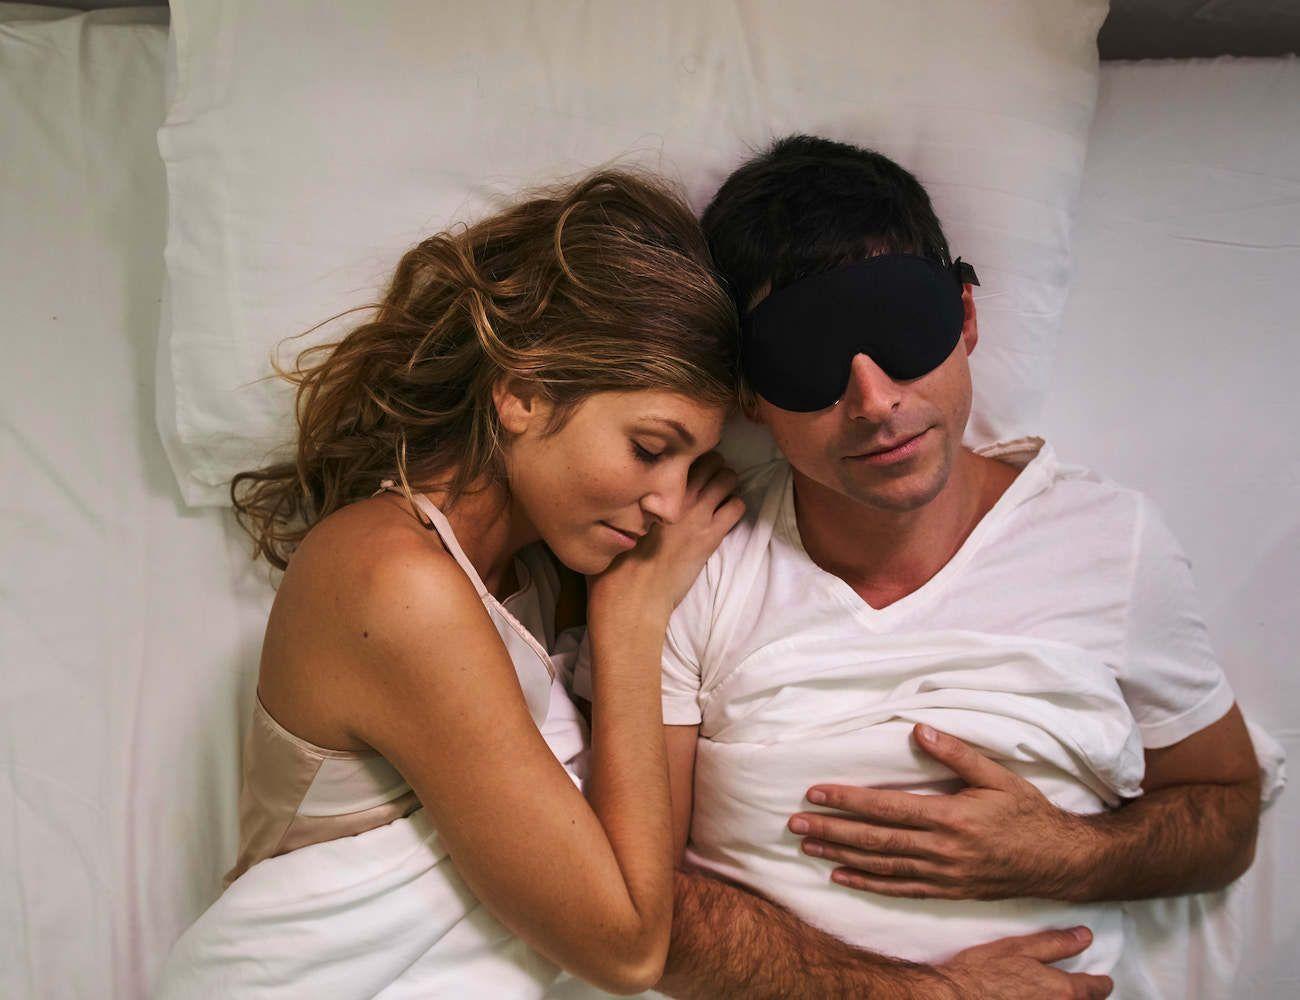 Silent Partner SmartMask Anti-Snoring Sleep Mask